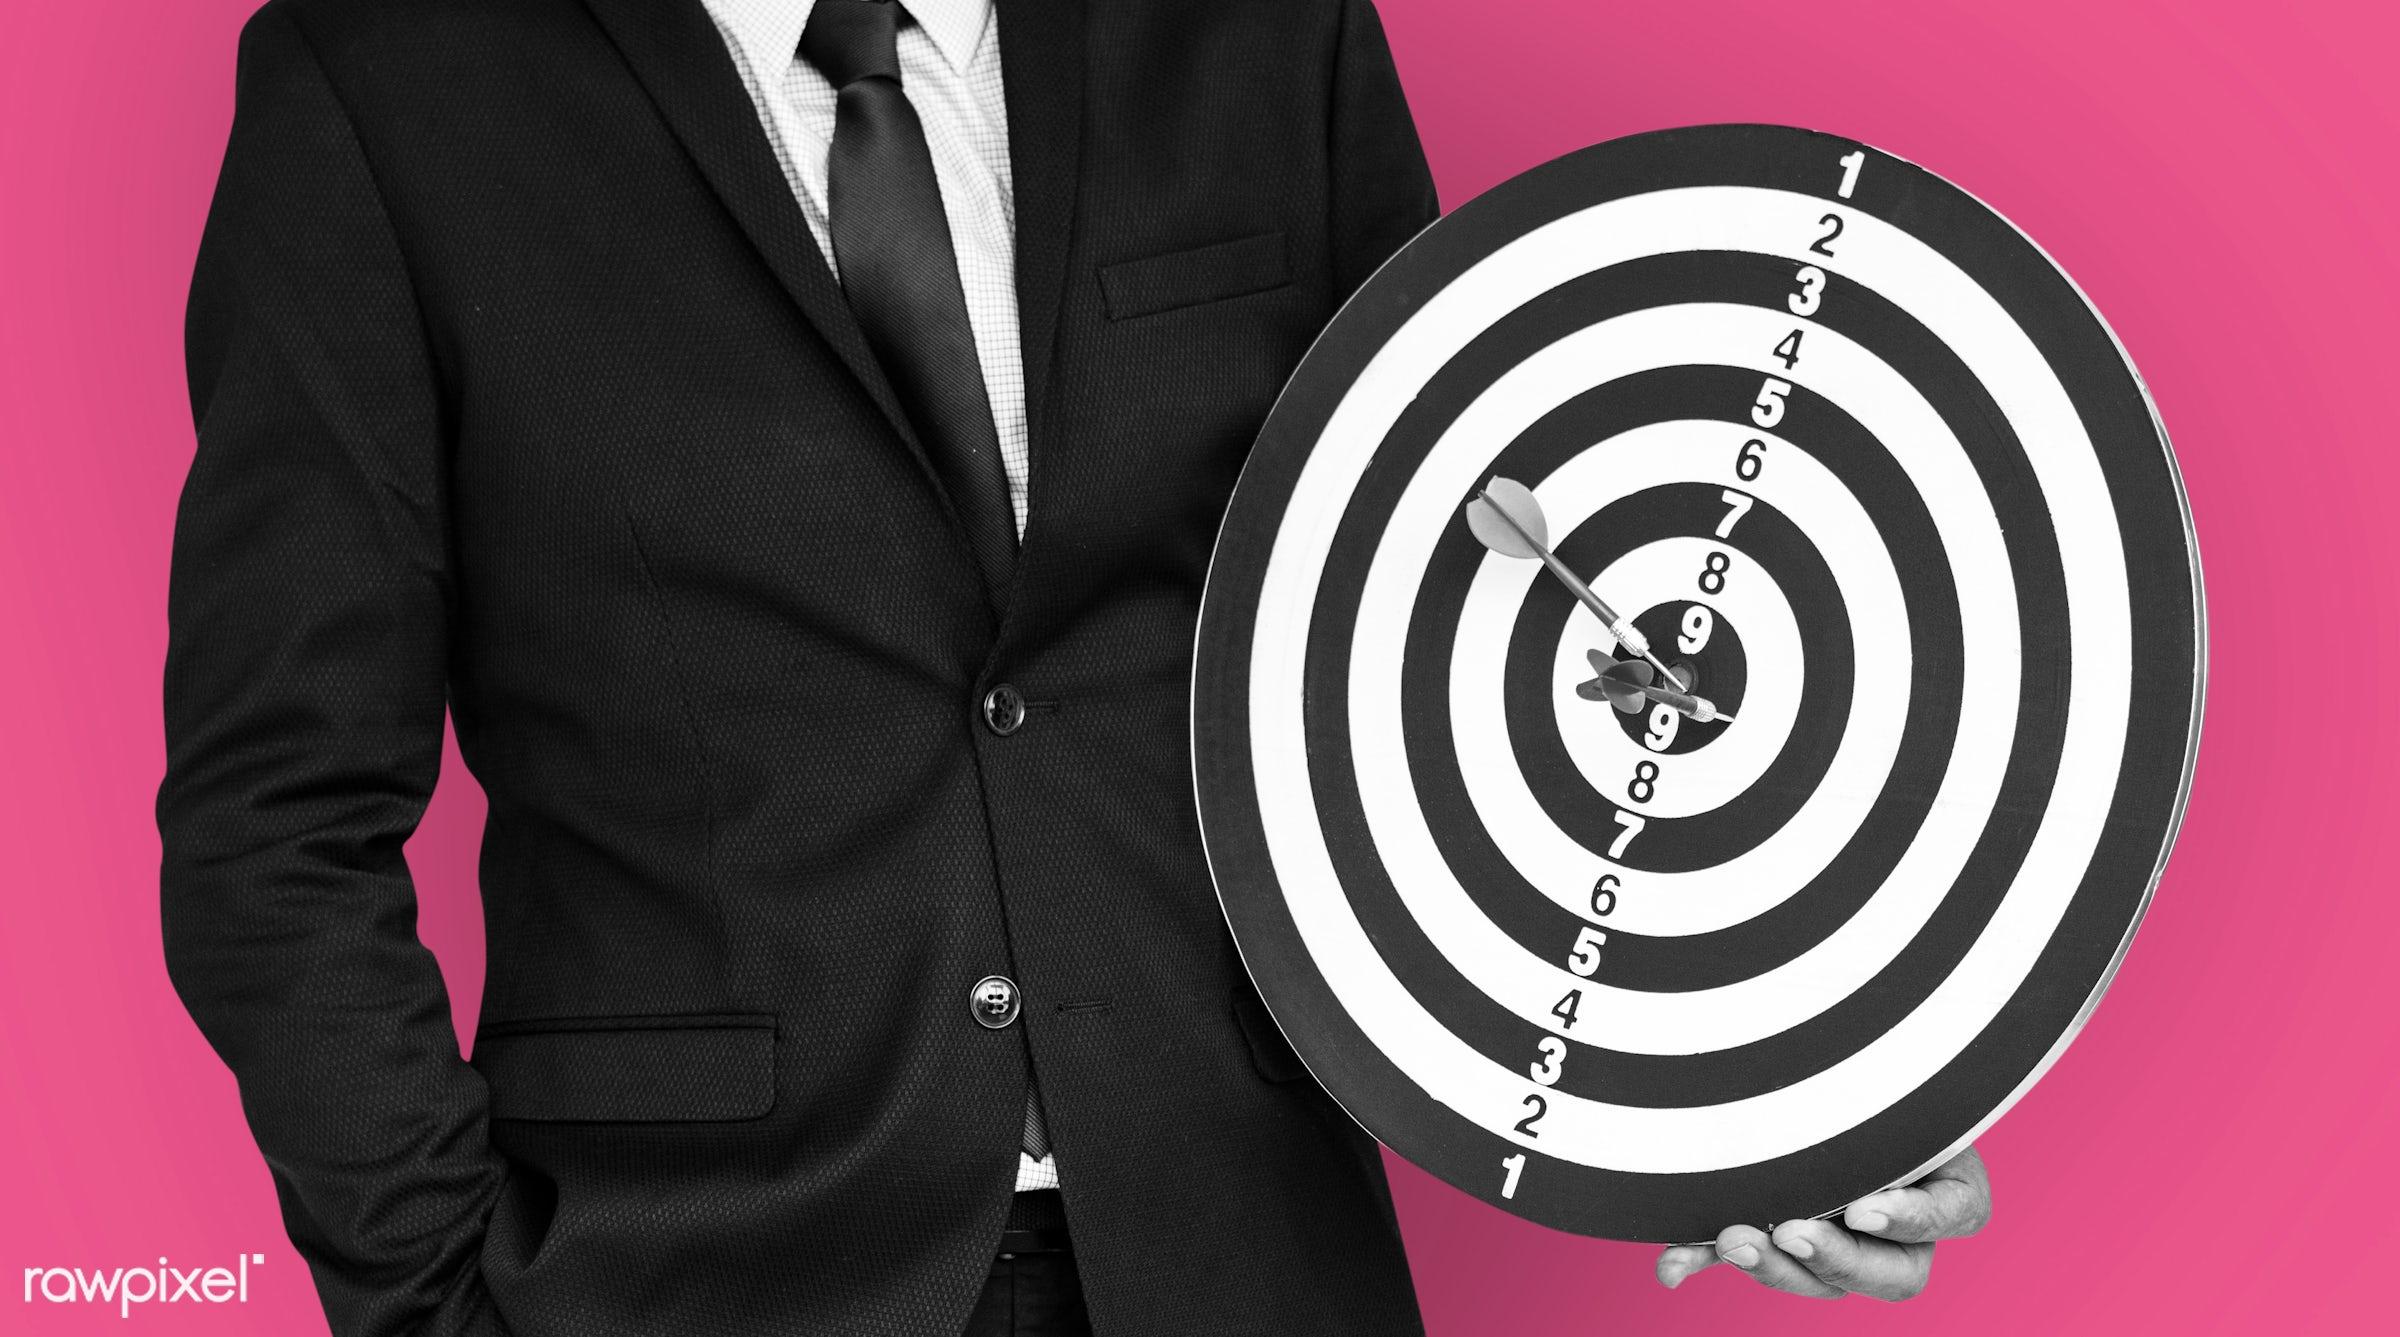 achieve, adult, background, bullseye, business dress, business wear, dart board, darts, expression, formal, formal wear,...